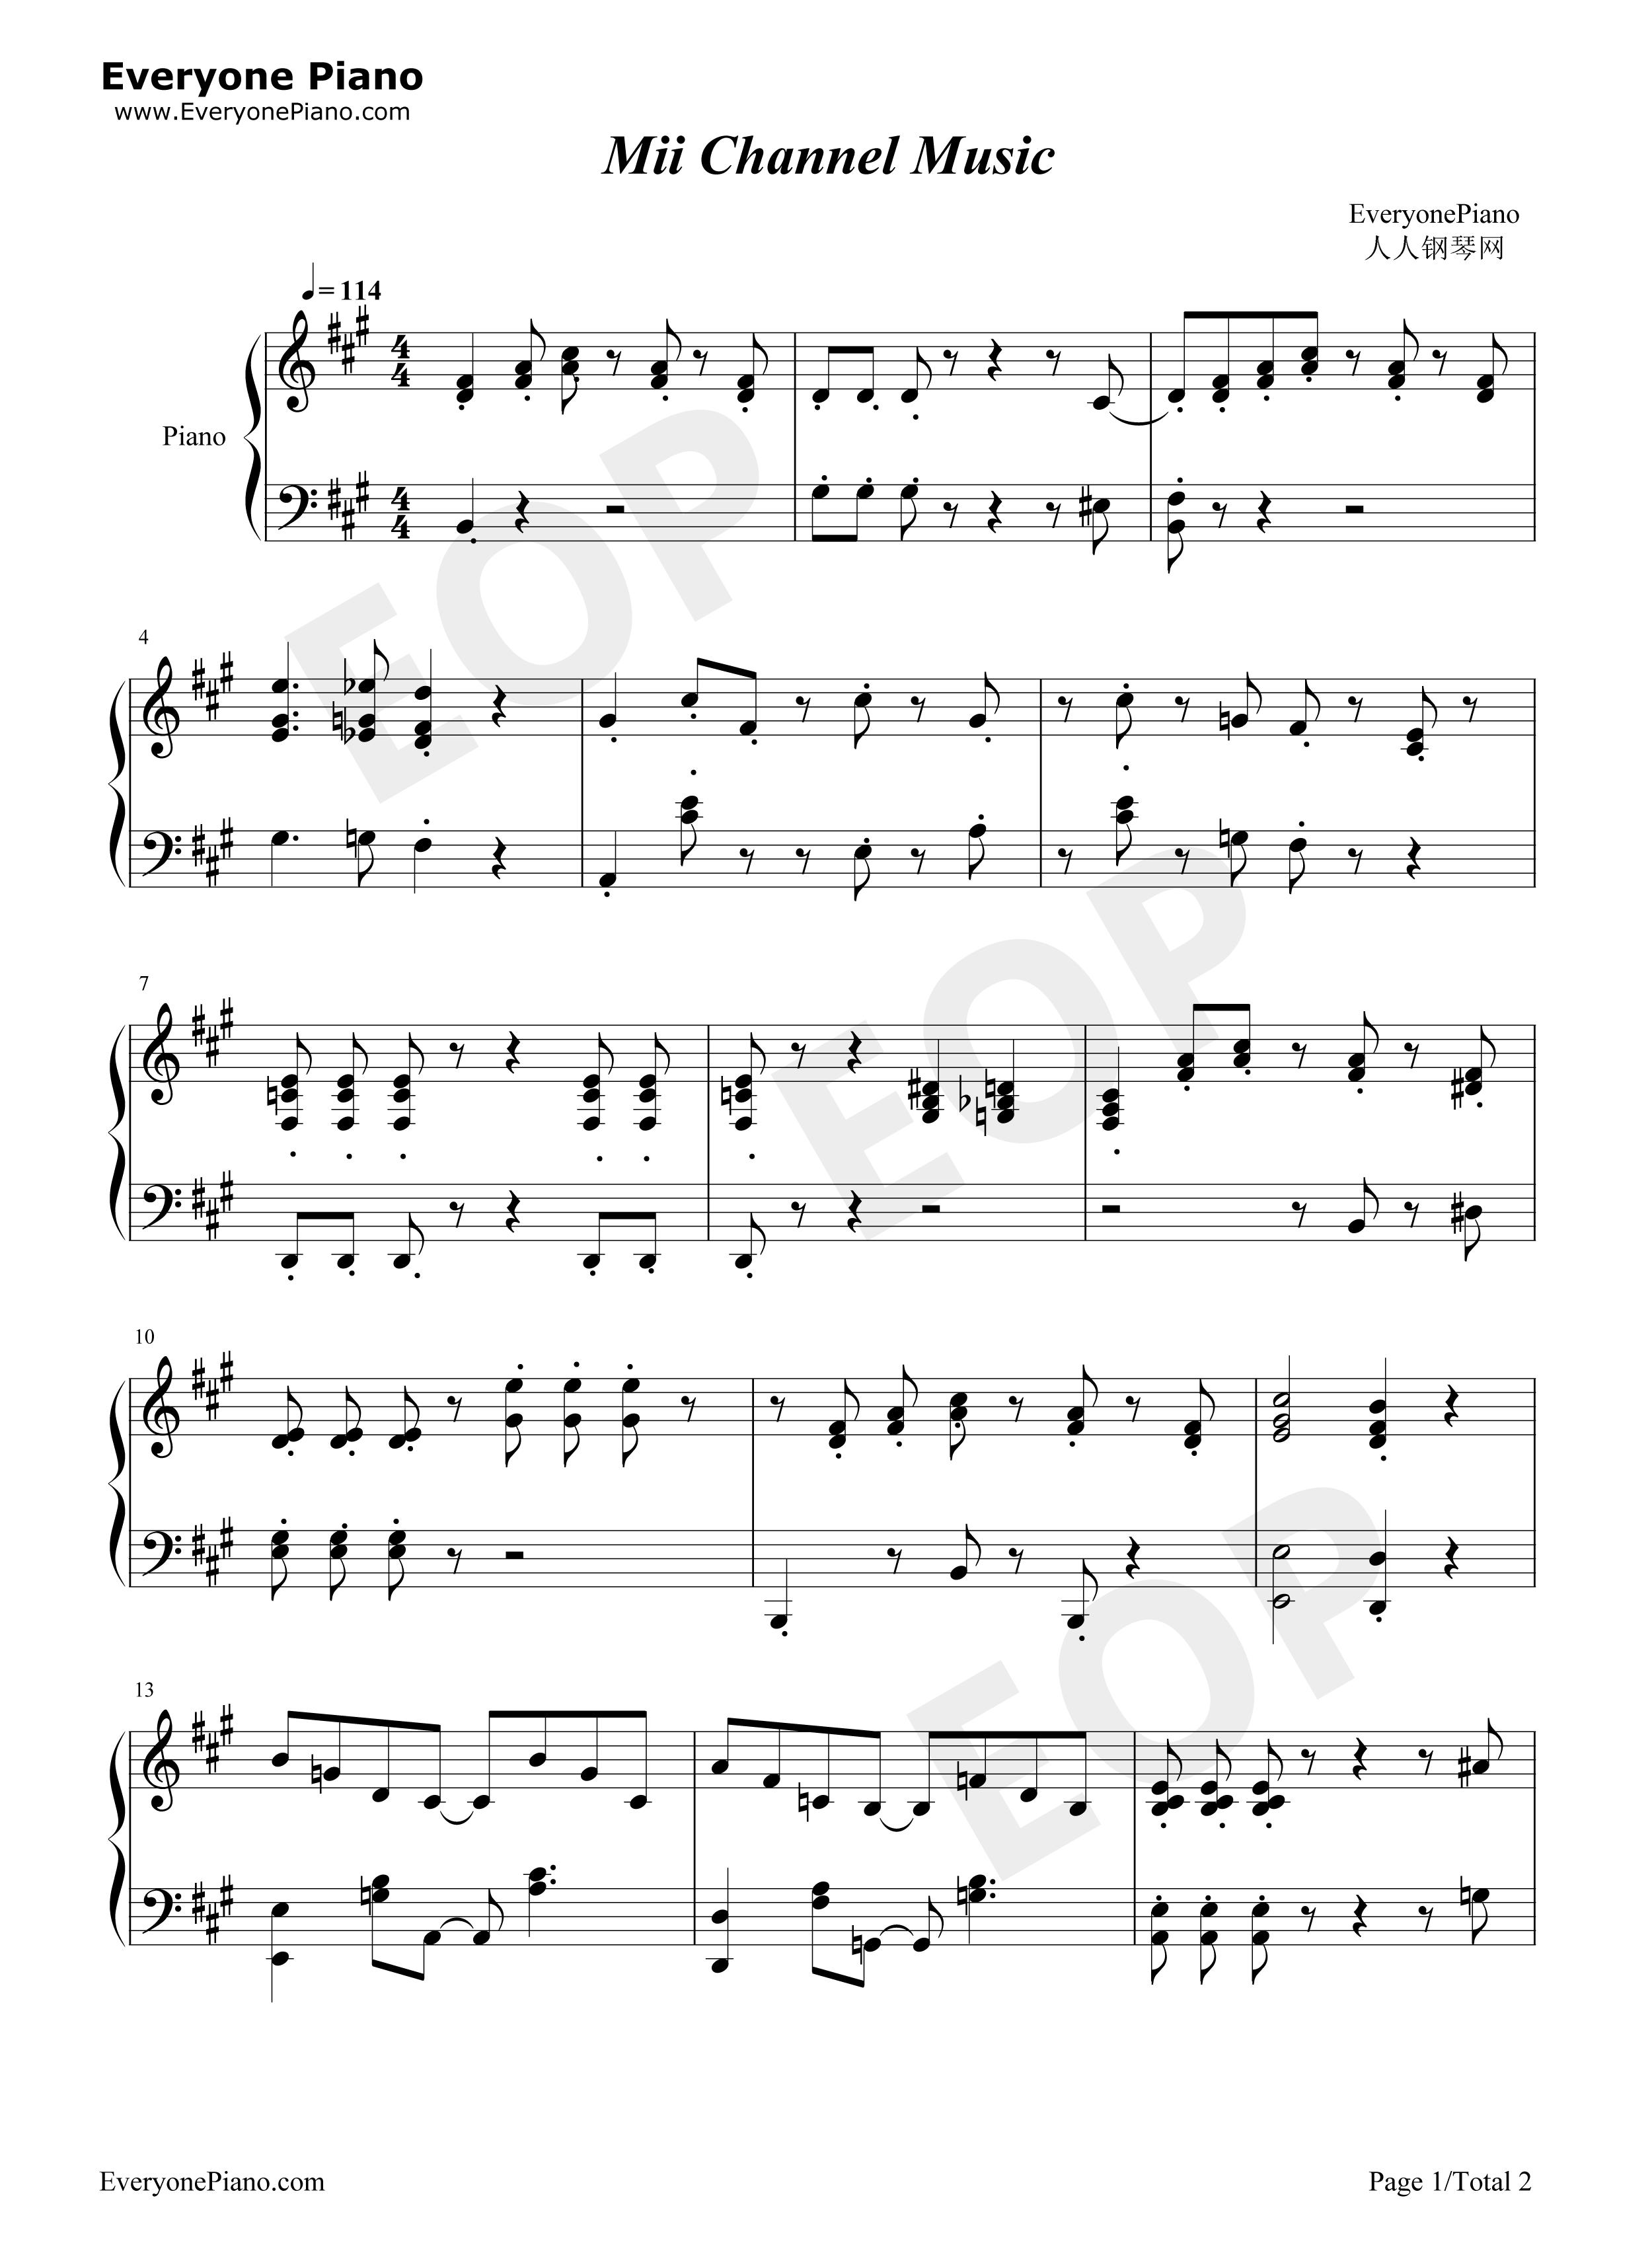 mii channel sheet music flute